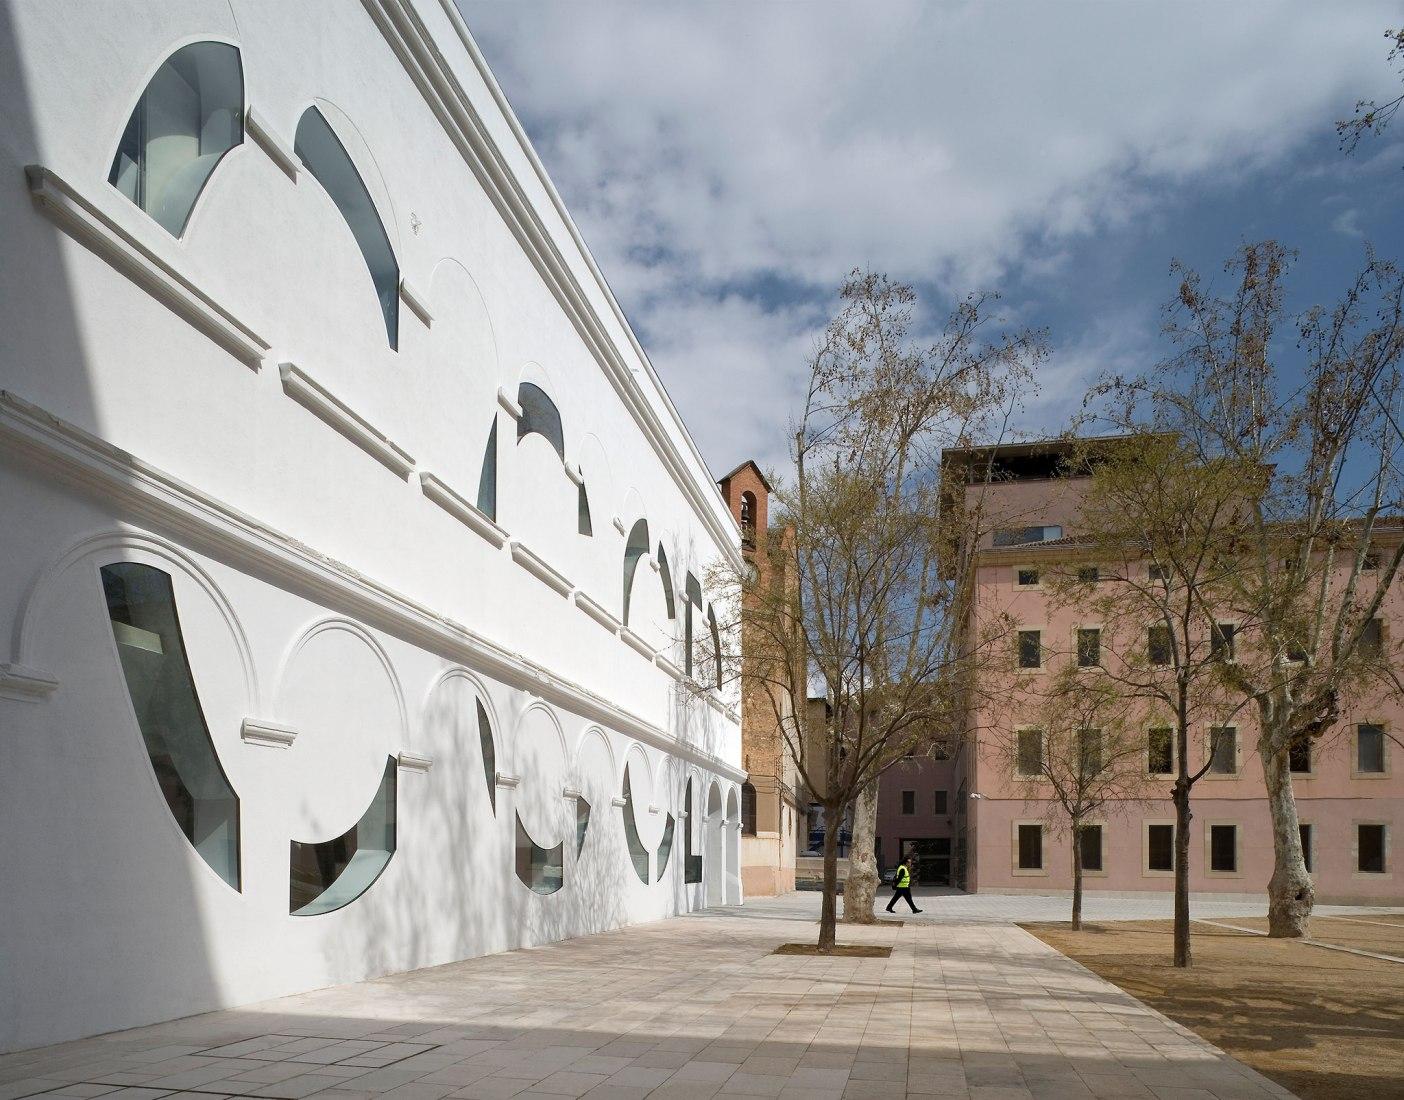 Centro cultural multidisciplinar, Teatro CCCB. Fotografía por Lourdes Jansana